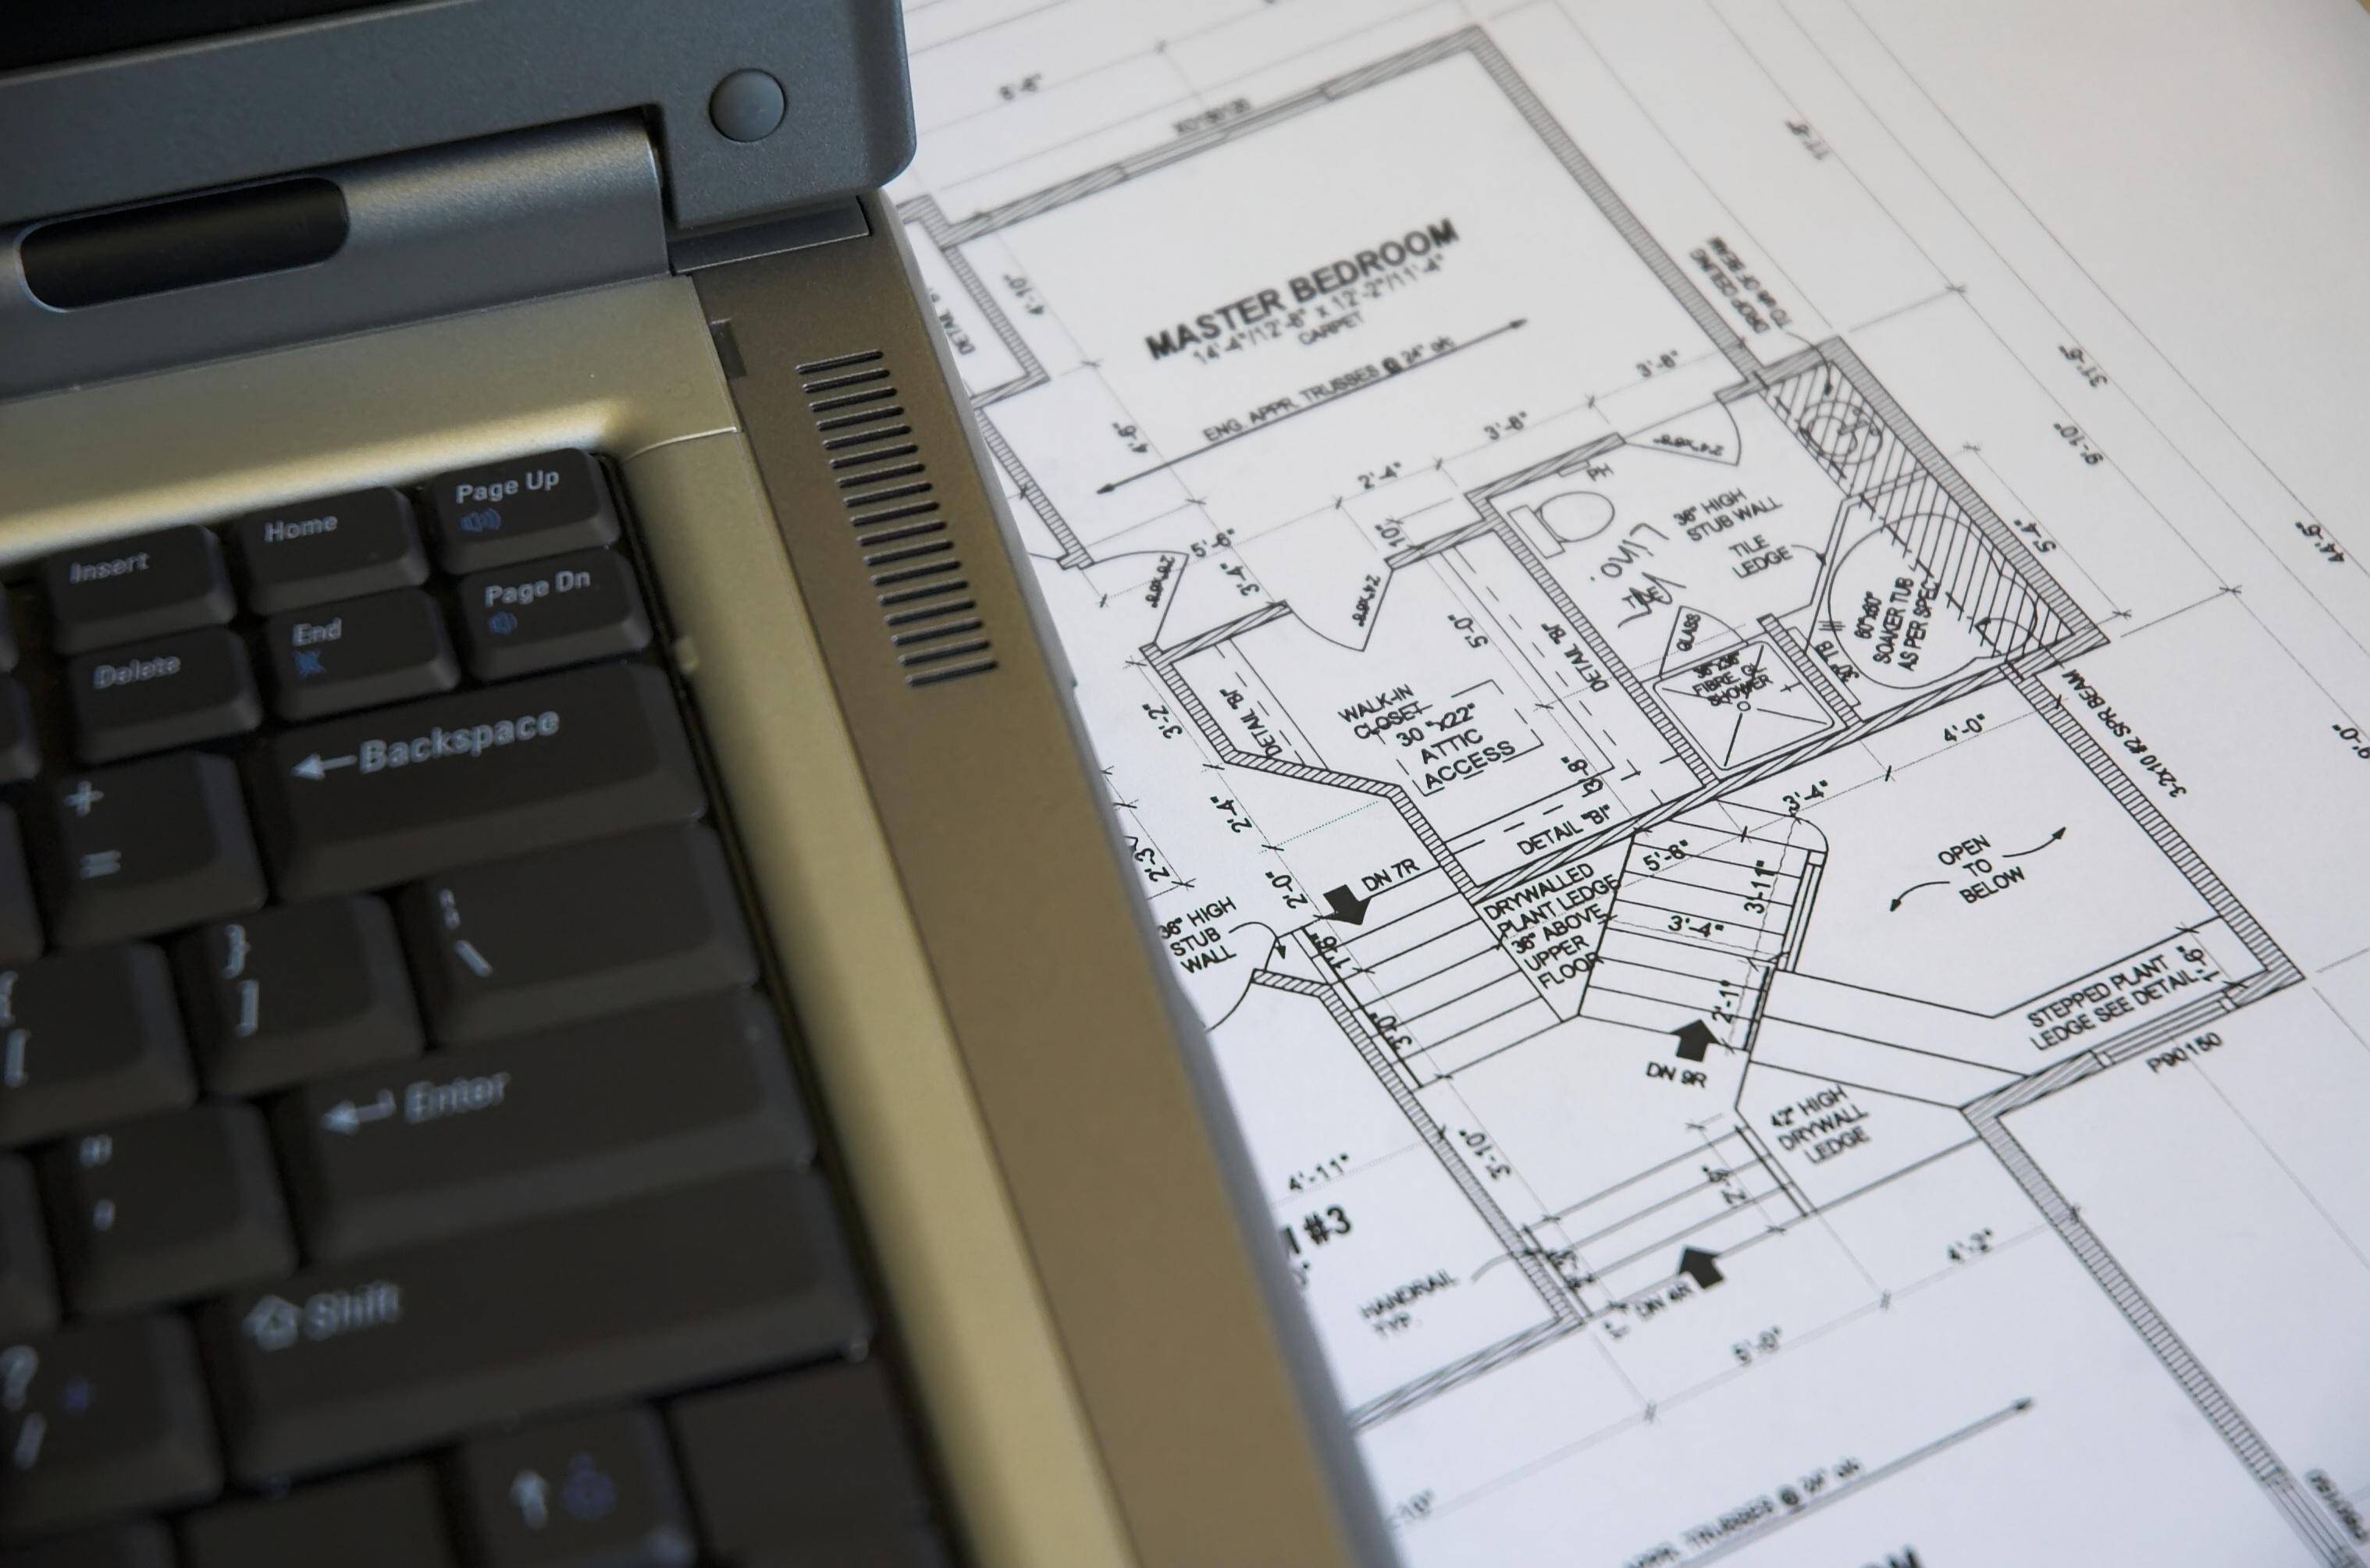 design of master suite adjacent to a computer